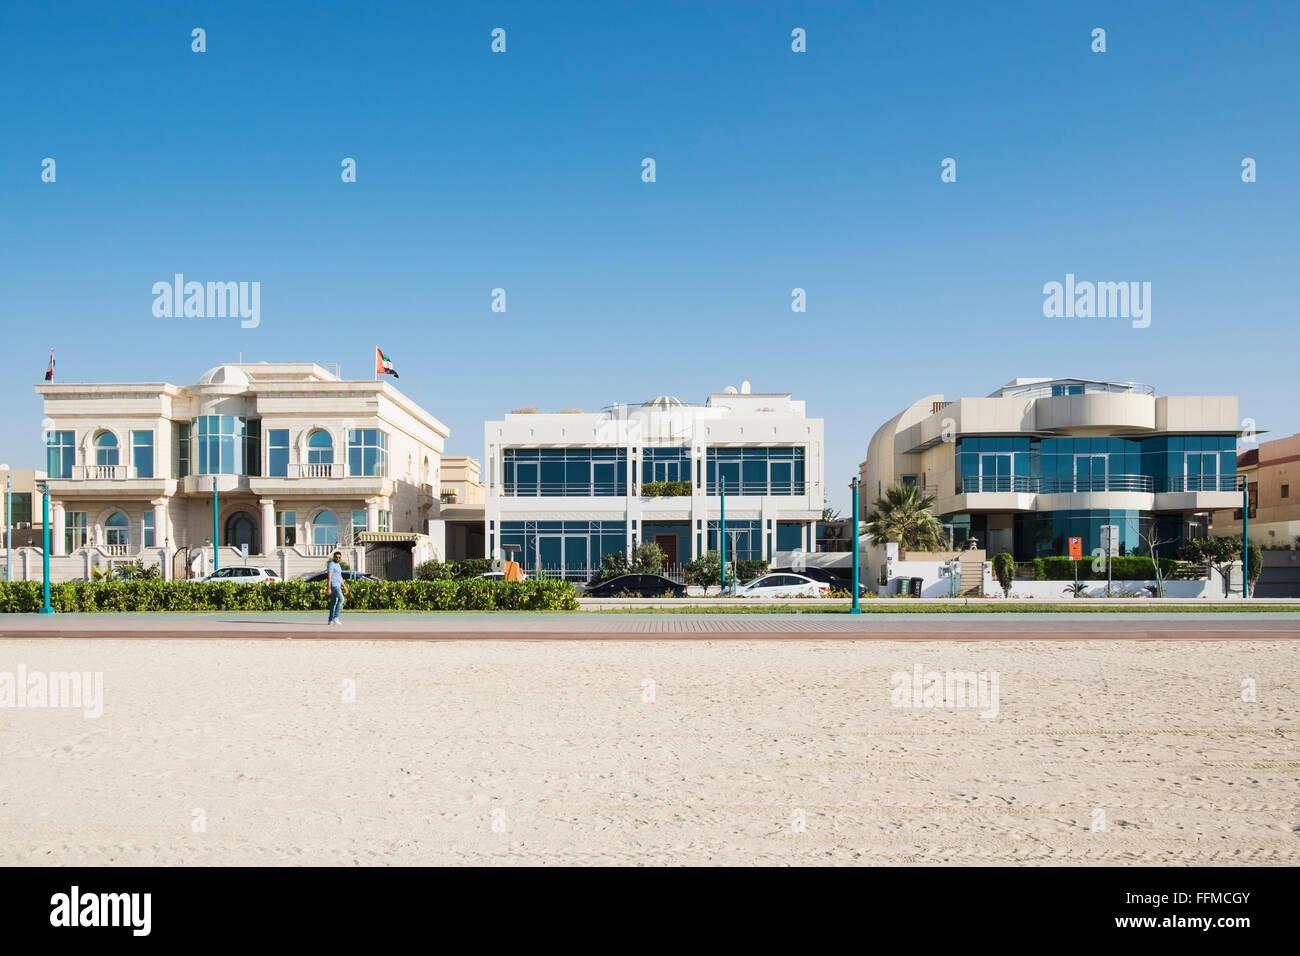 Luxury villas facing onto beach in Dubai United Arab Emirates - Stock Image